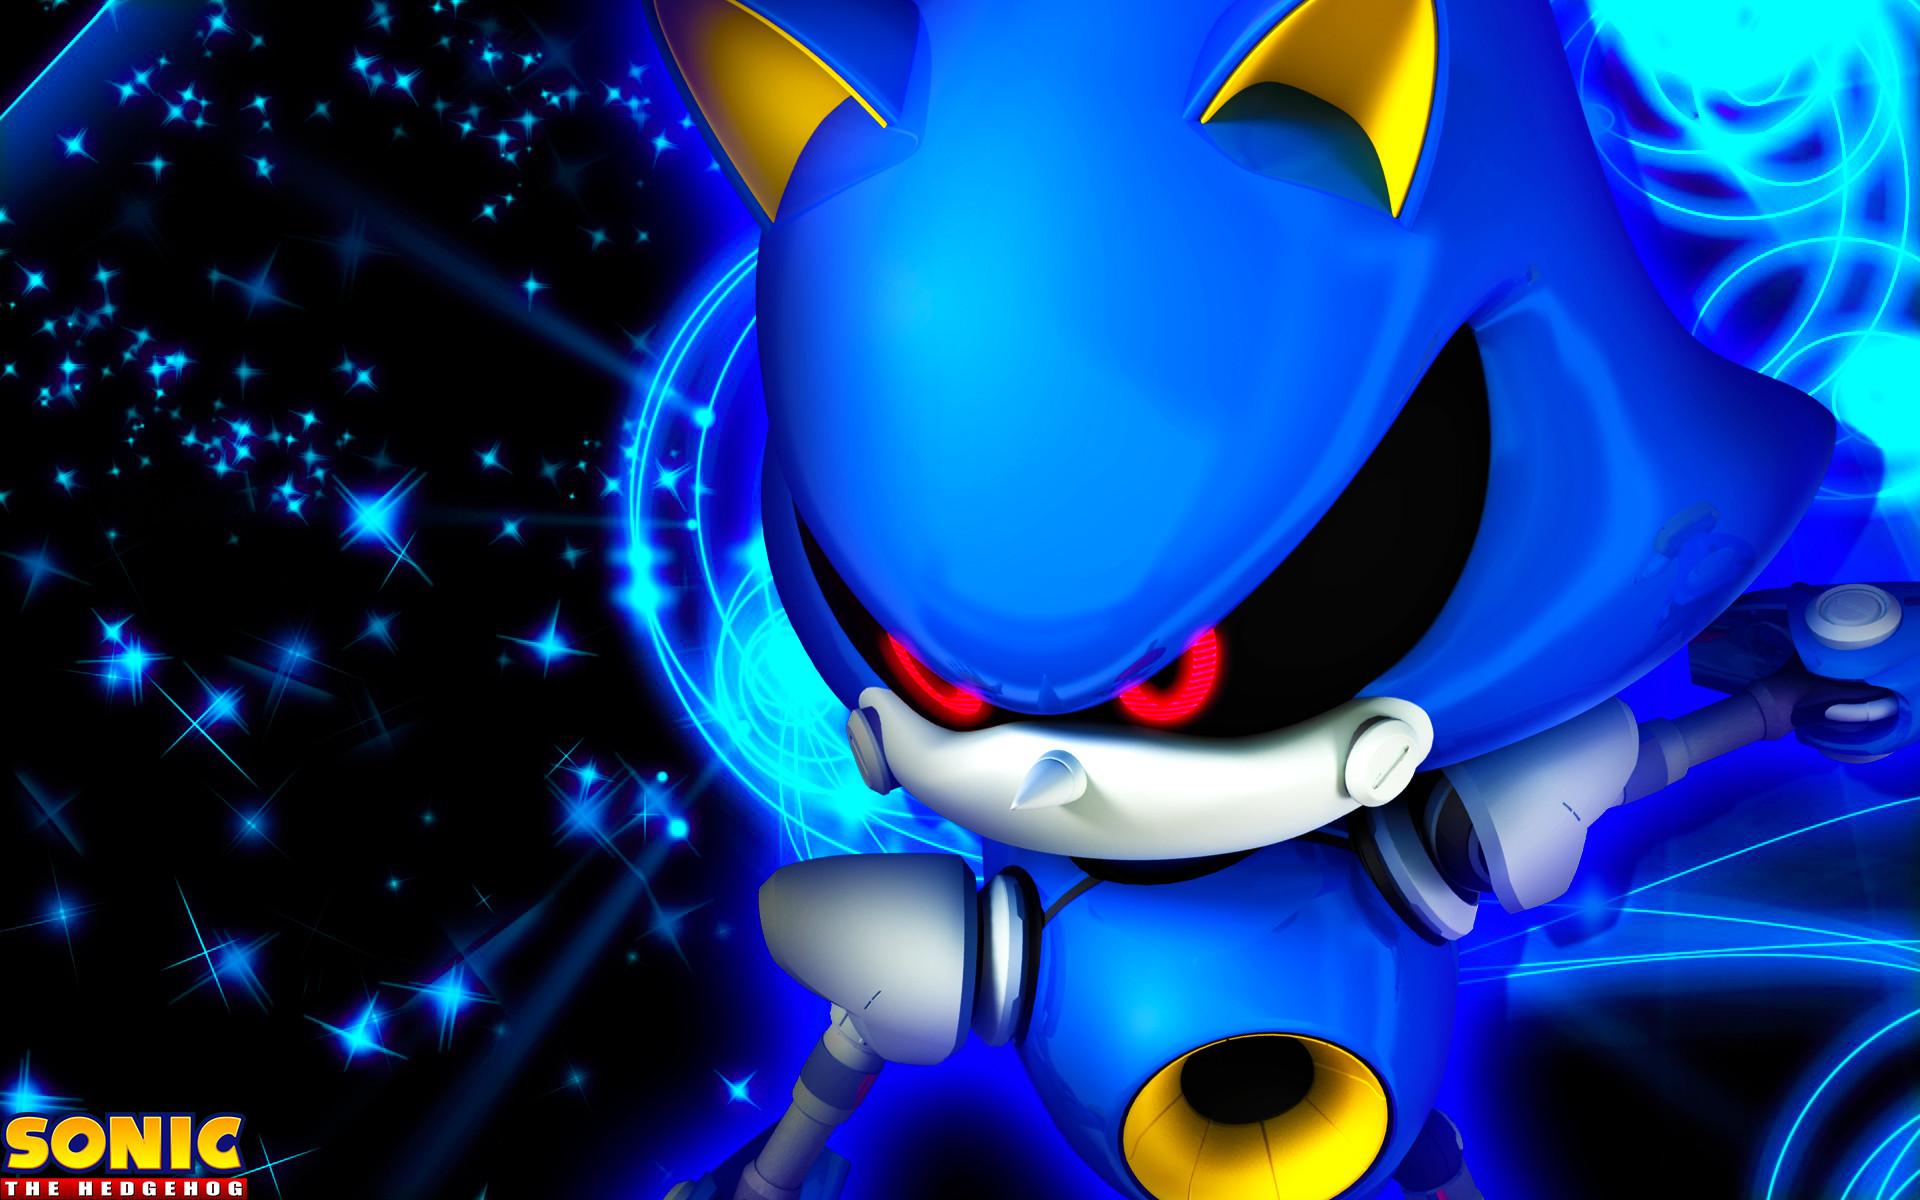 metal sonic wallpaper by sonicthehedgehogbg customization wallpaper. Sonic  the Hedgehog Wallpapers WallpaperSafari